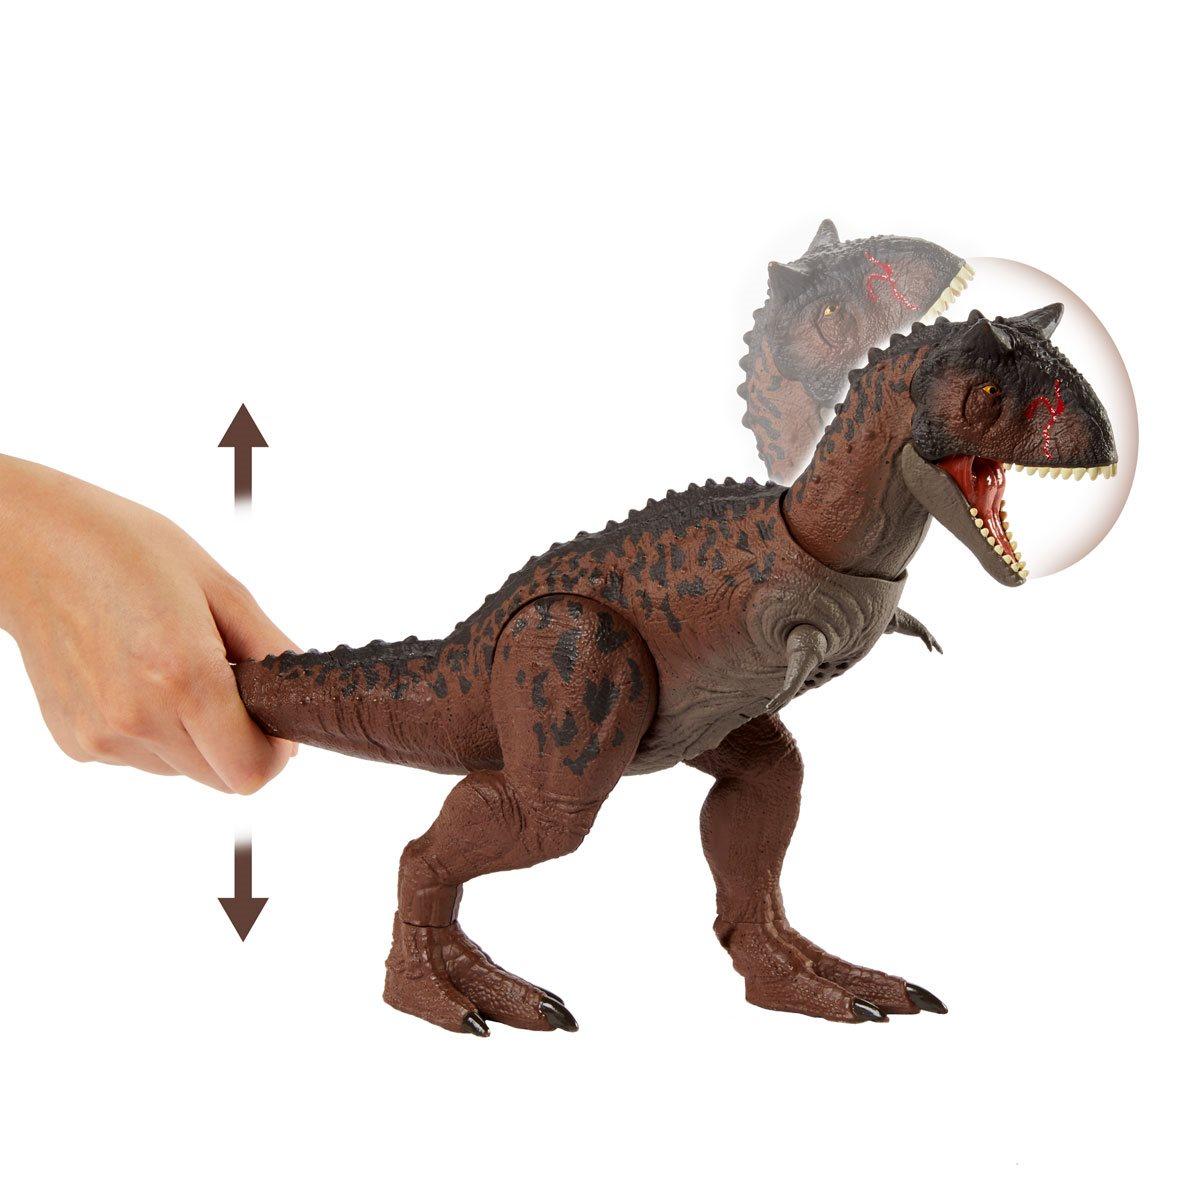 NEW! Jurassic World Control 'N Conquer Carnotaurus Dinosaur Figure Toy